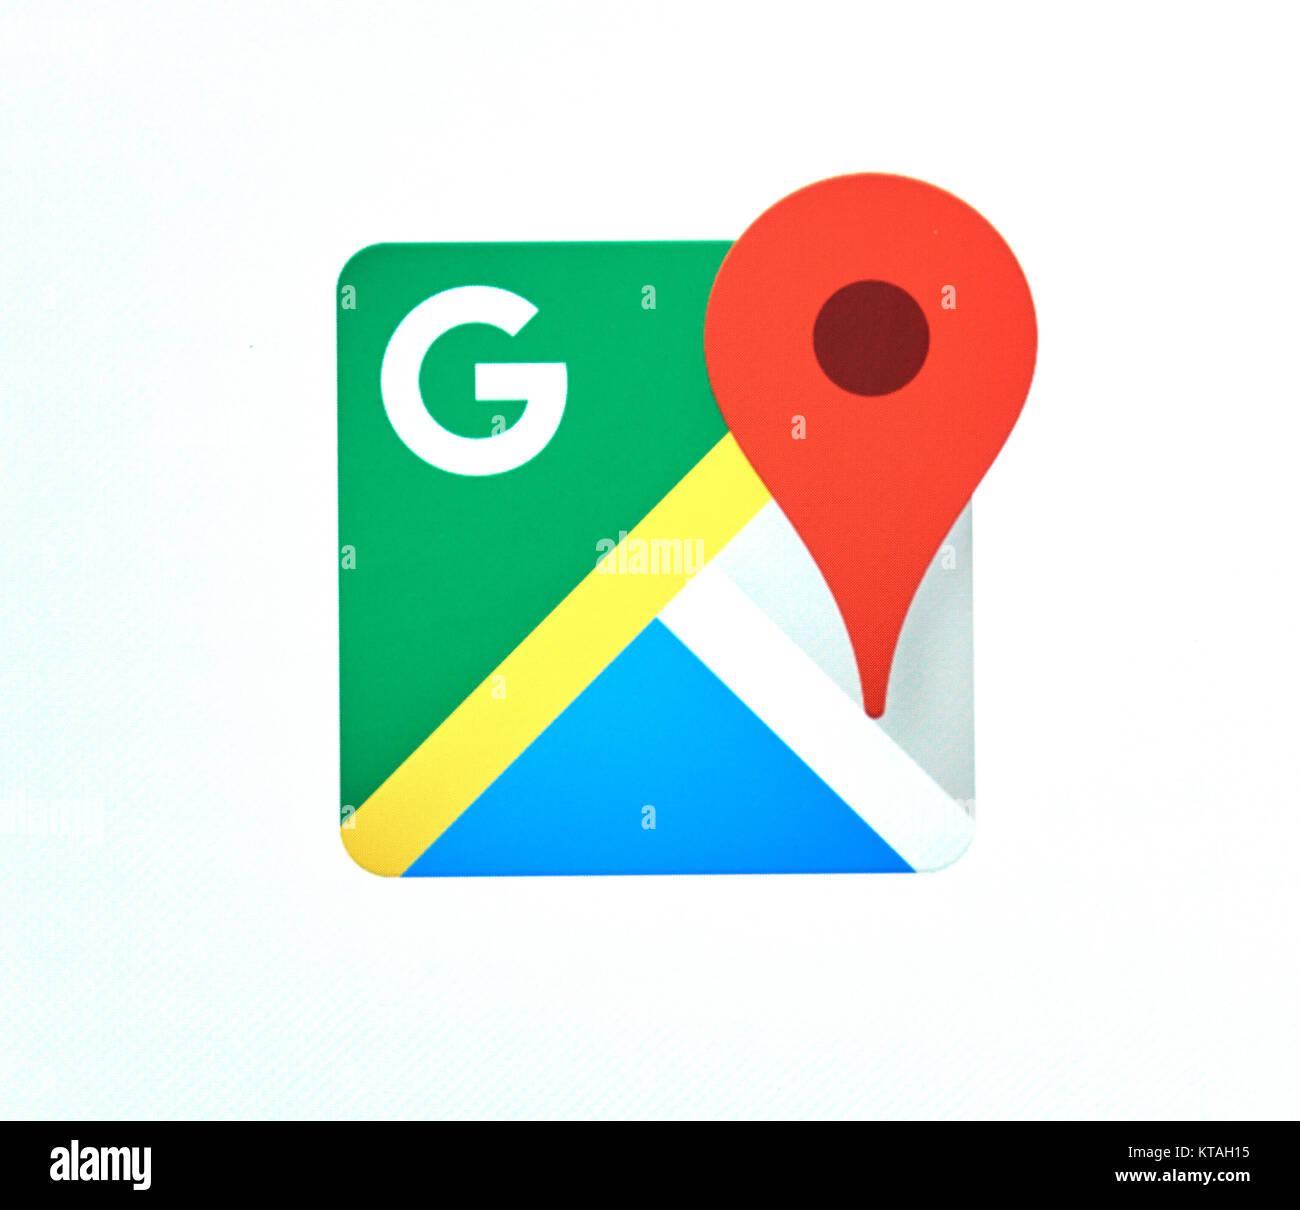 Google Maps Stock Photos & Google Maps Stock Images